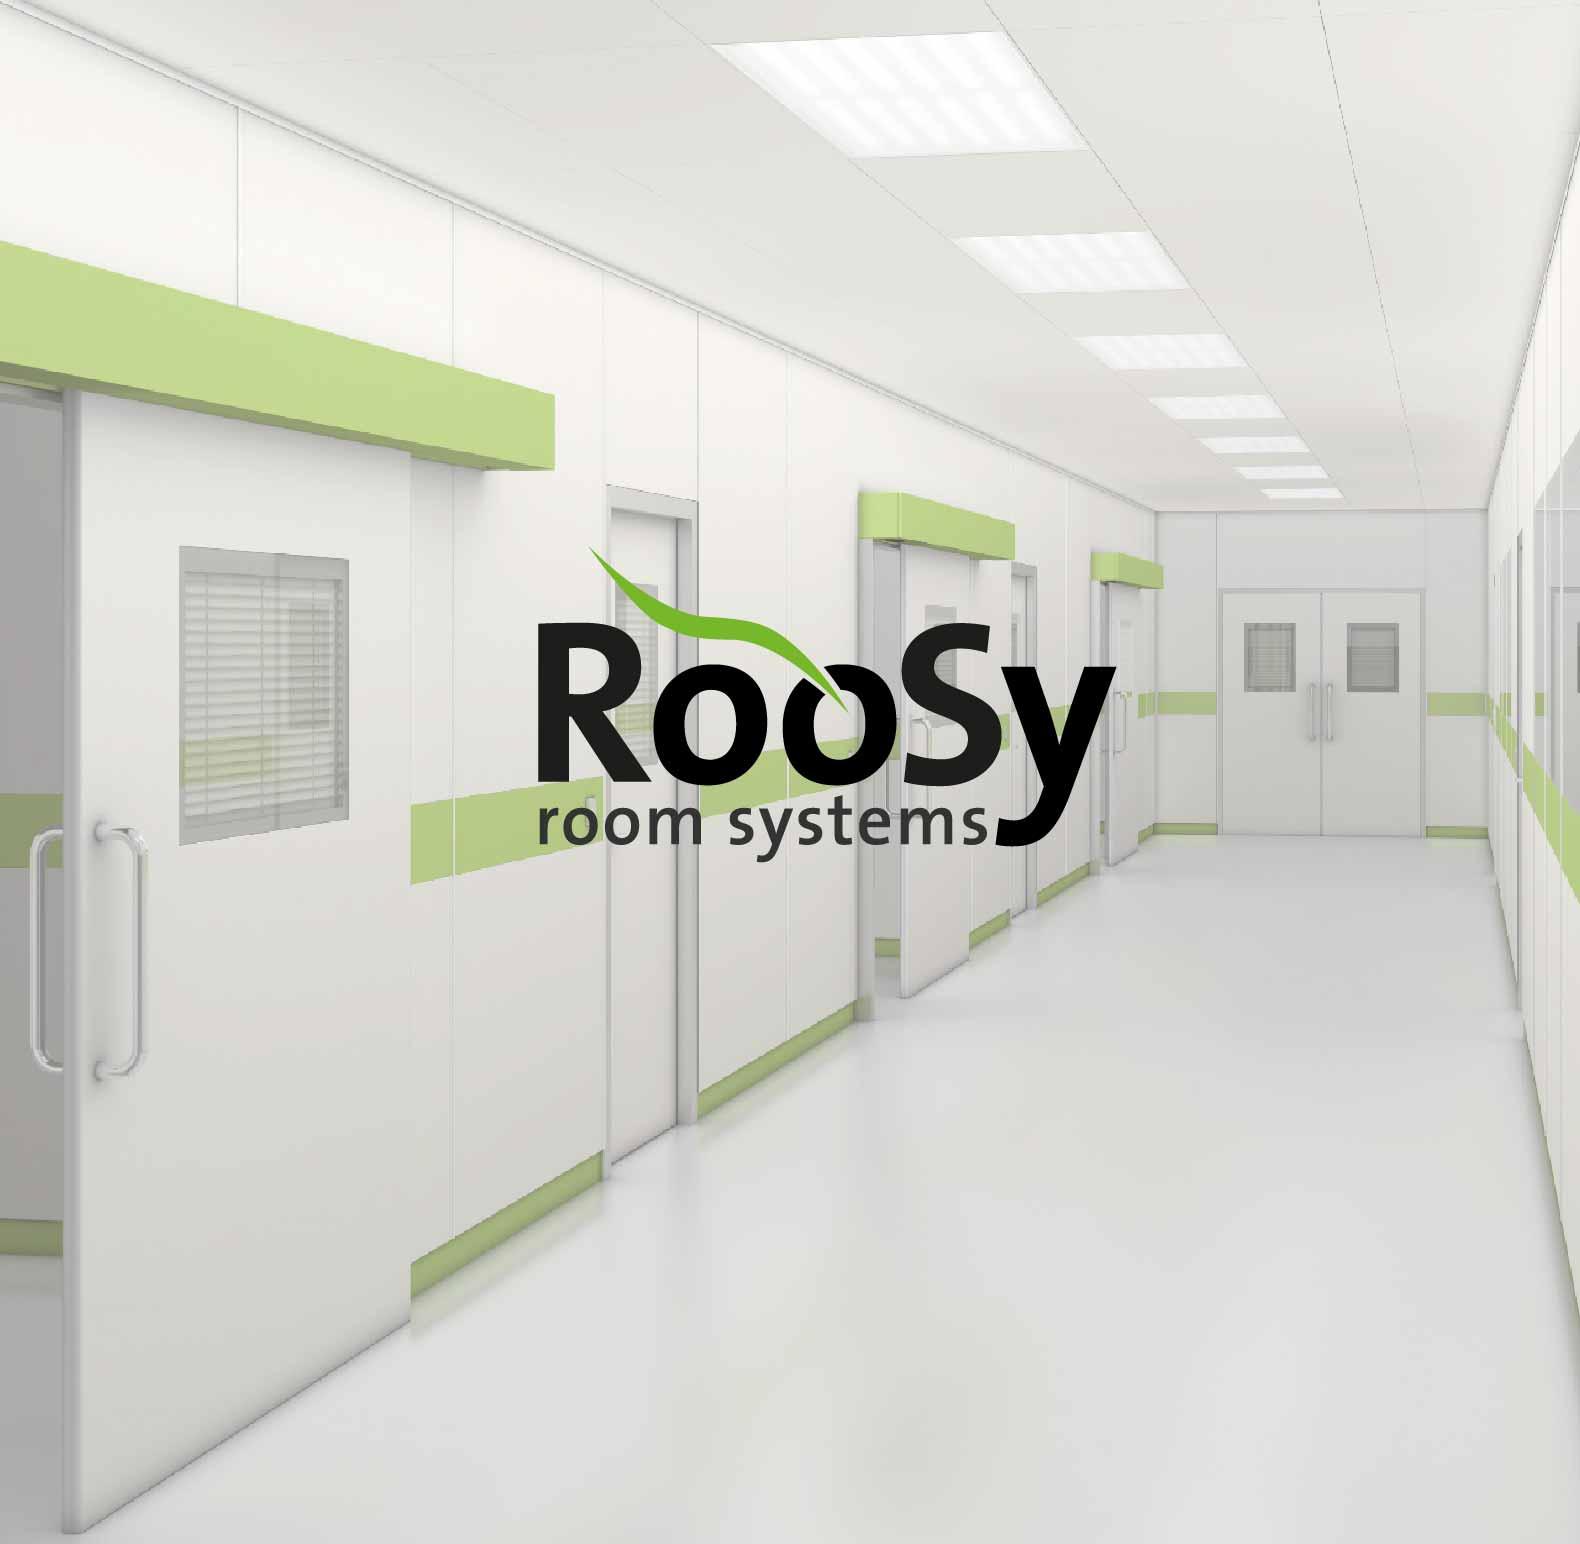 roosy_medifa_new_1-01